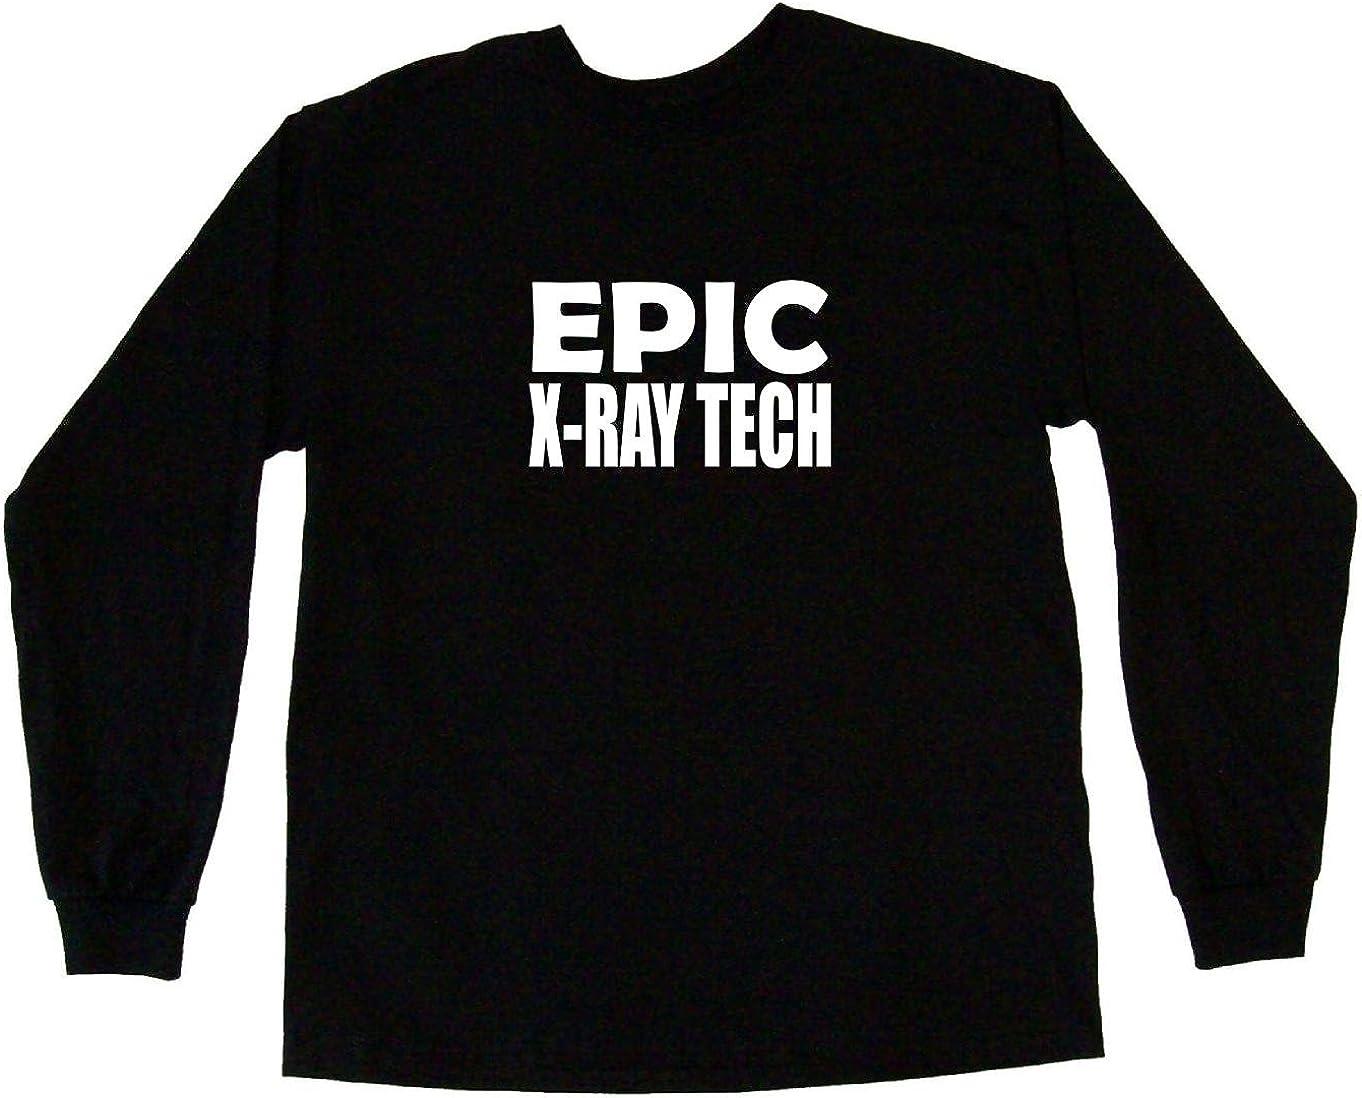 Epic X-Ray Tech Womens Regular Fit Tee Shirt